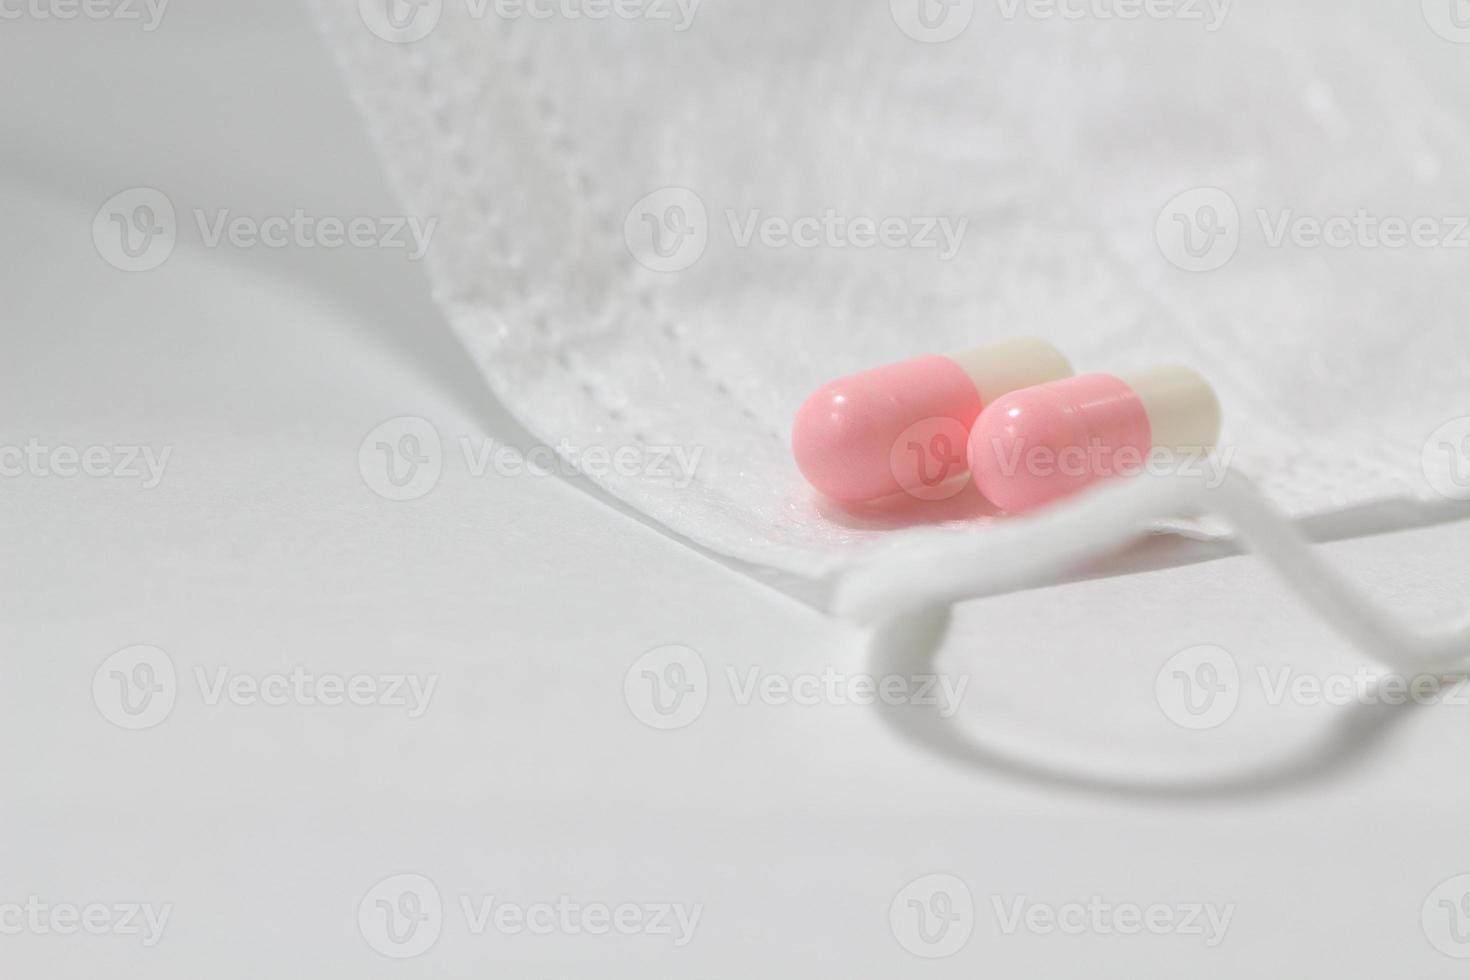 masker en medicijnen foto